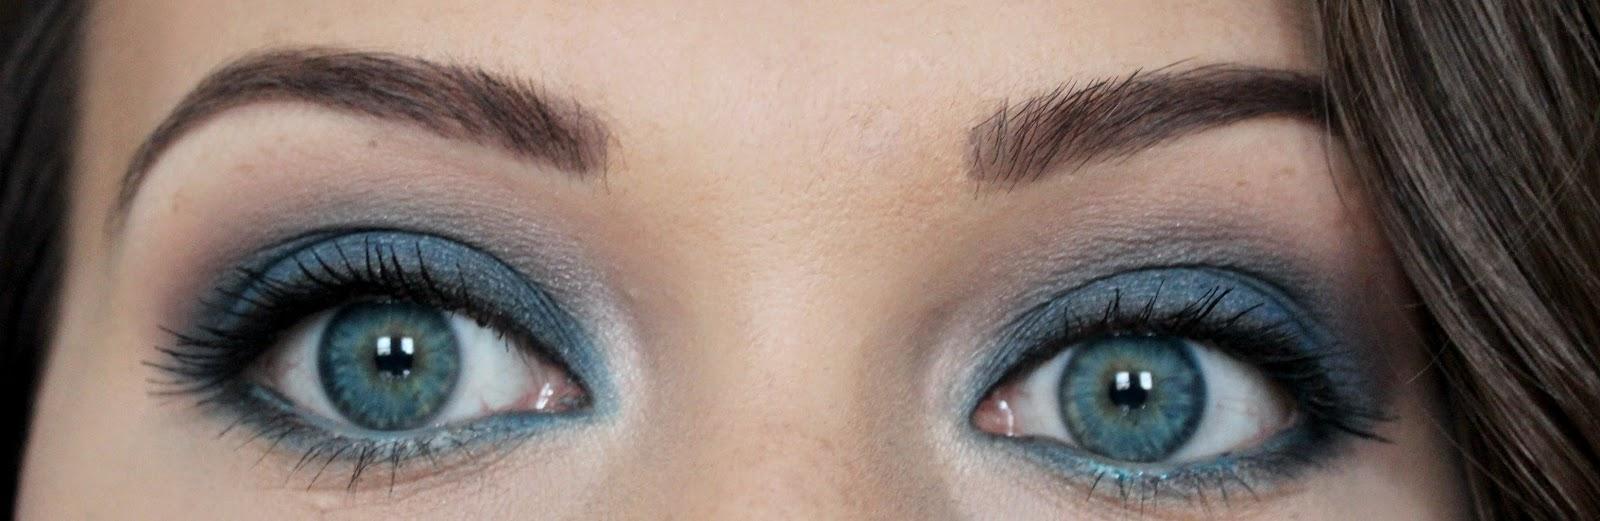 makeup art by ingrida ramanauskaite blue mood dramatic